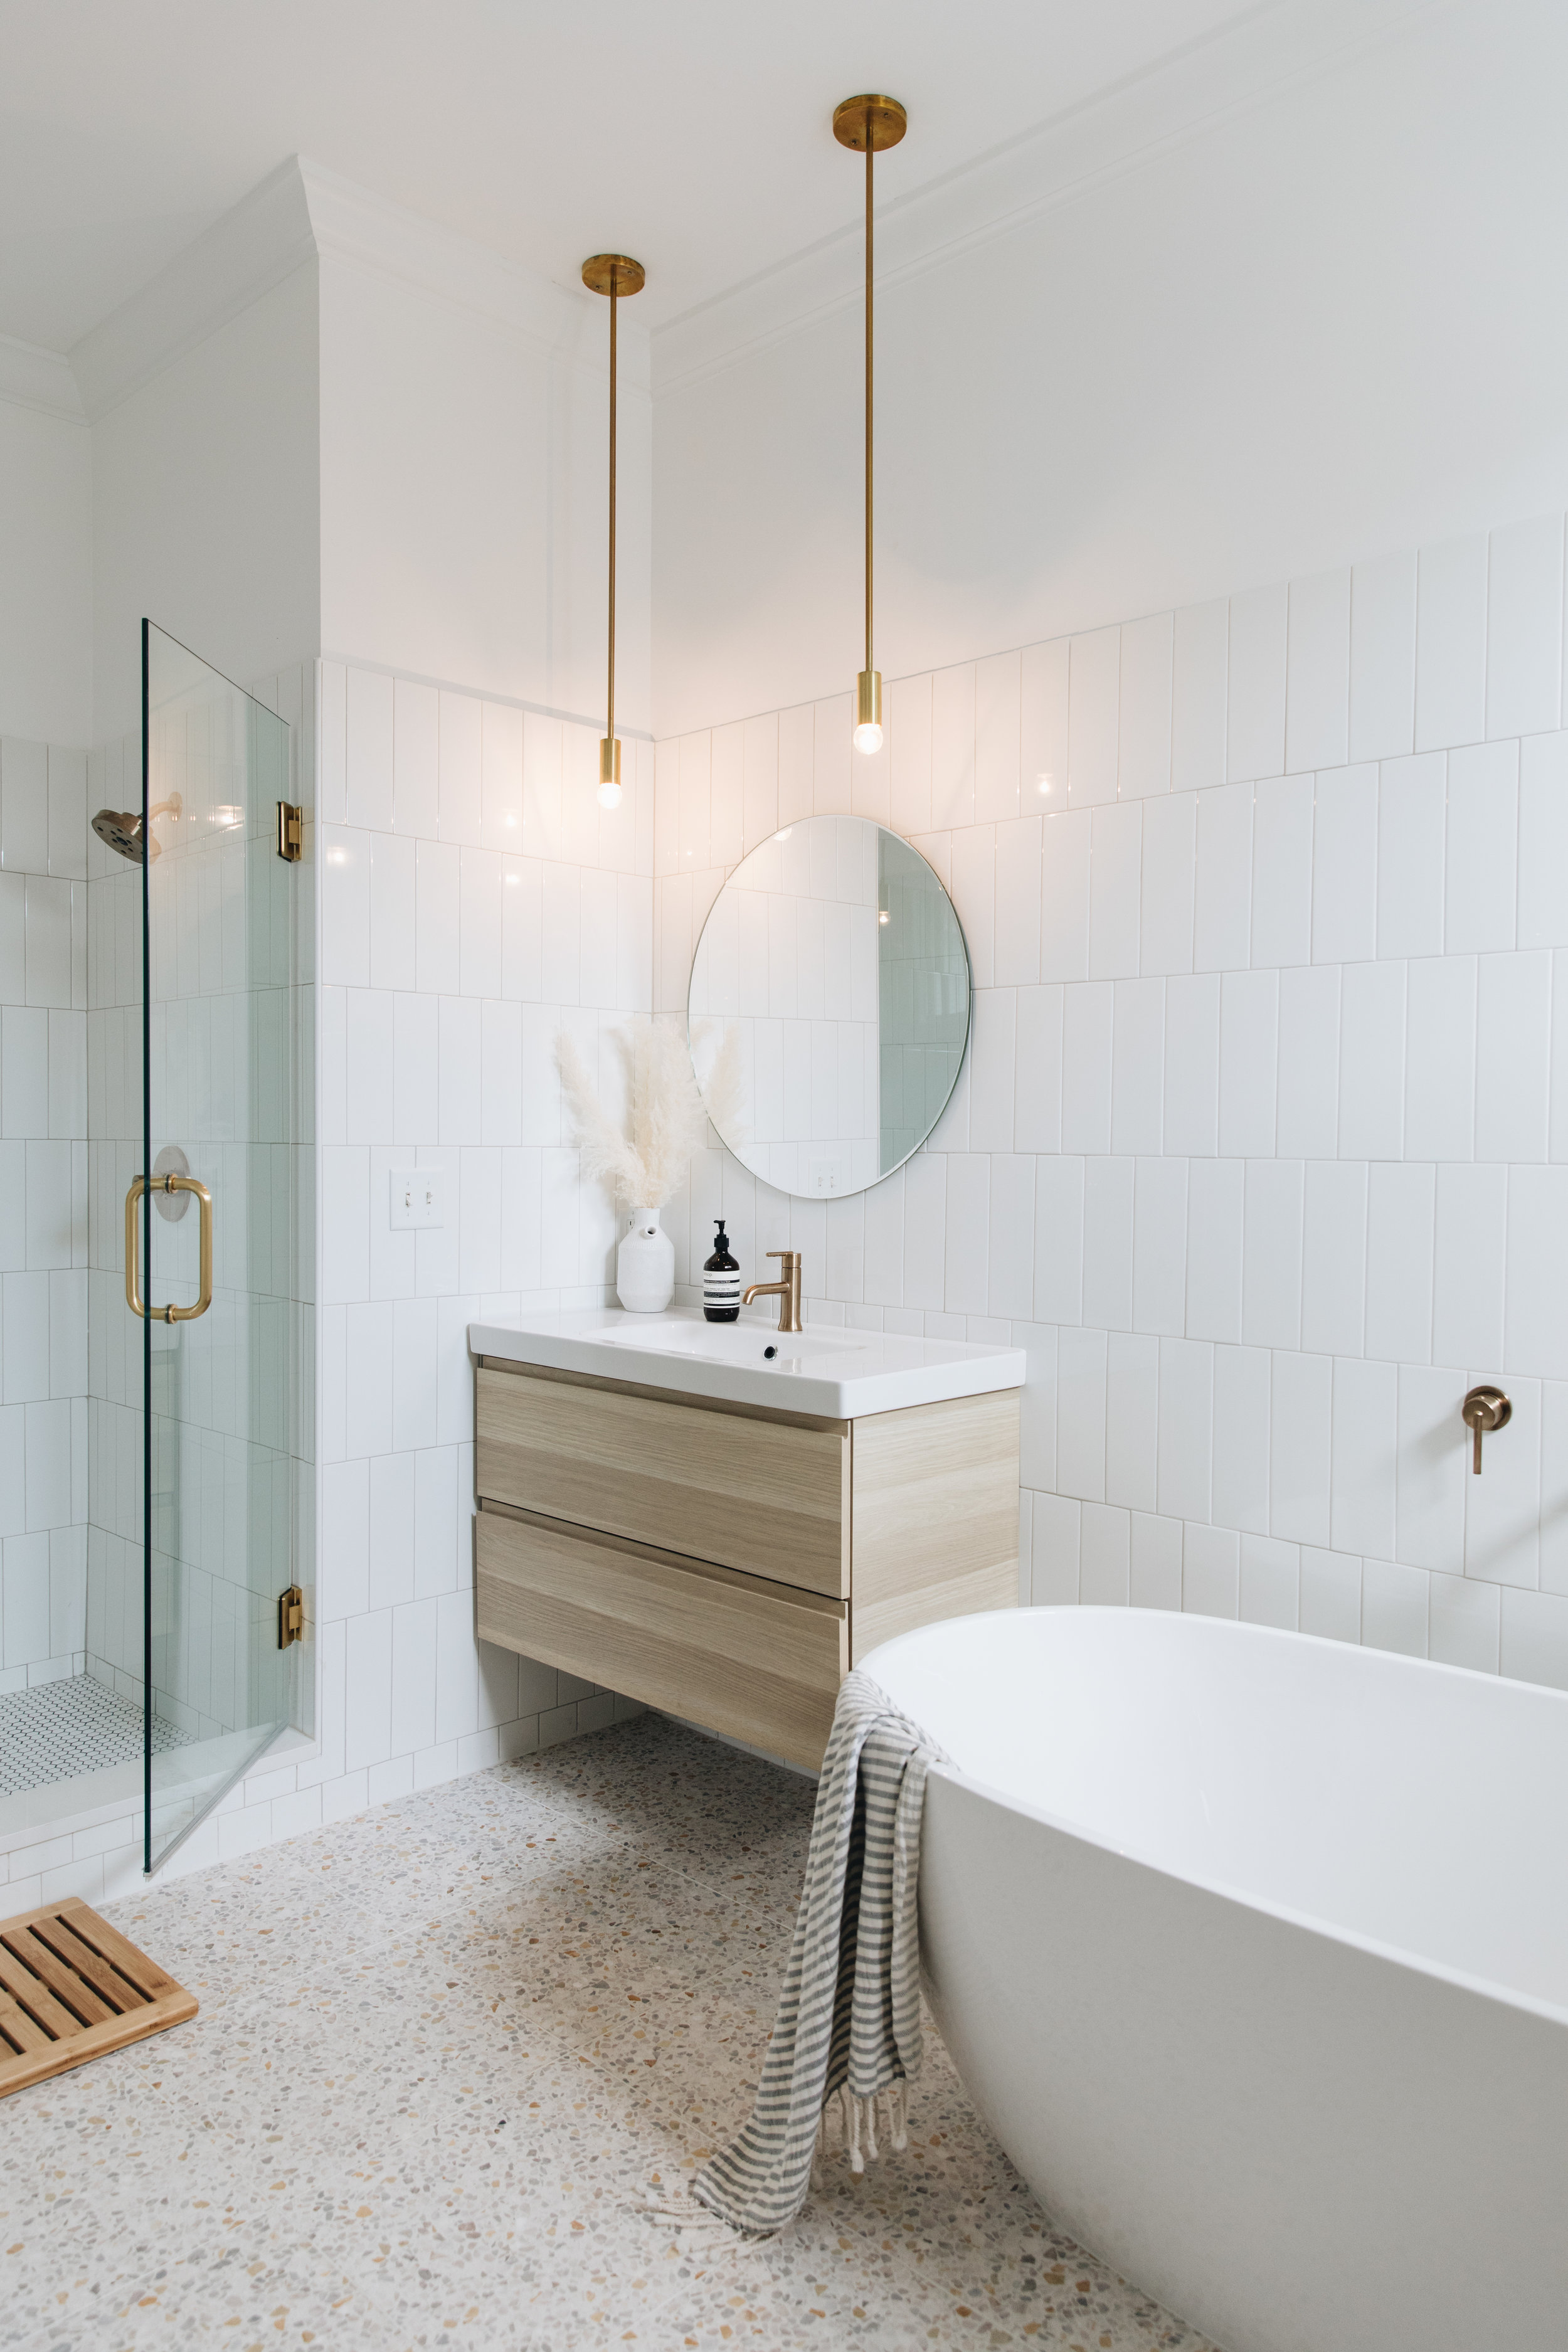 Vanity    Faucets    Mirrors    Pendants    Soaking Tub    Shower Trim